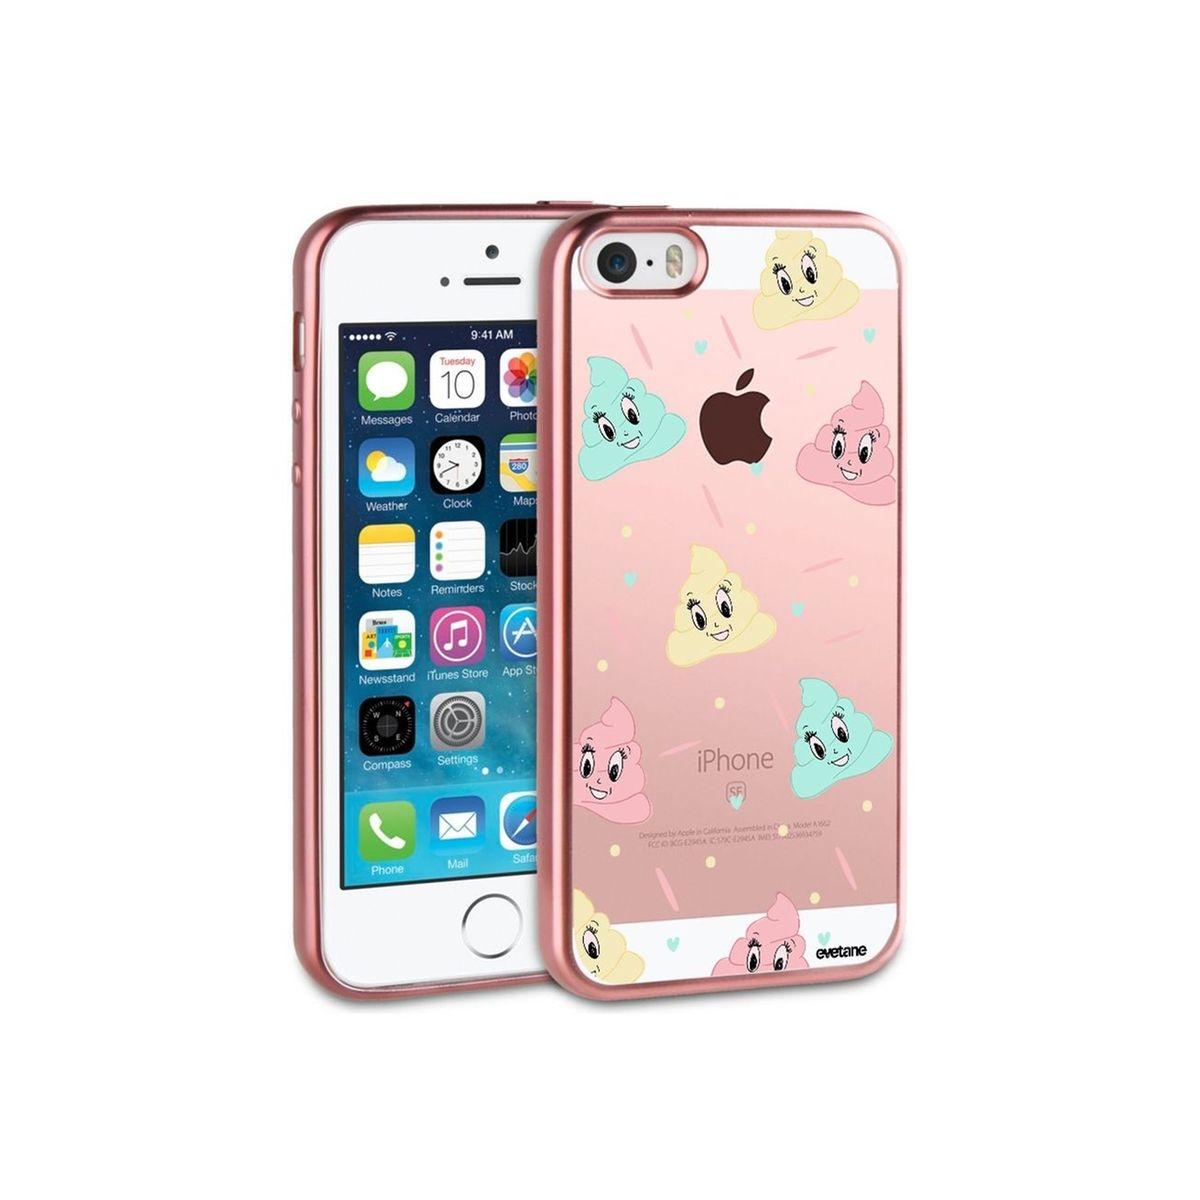 Coque iPhone 5/5S/SE bumper rose gold, Crottes, Evetane®